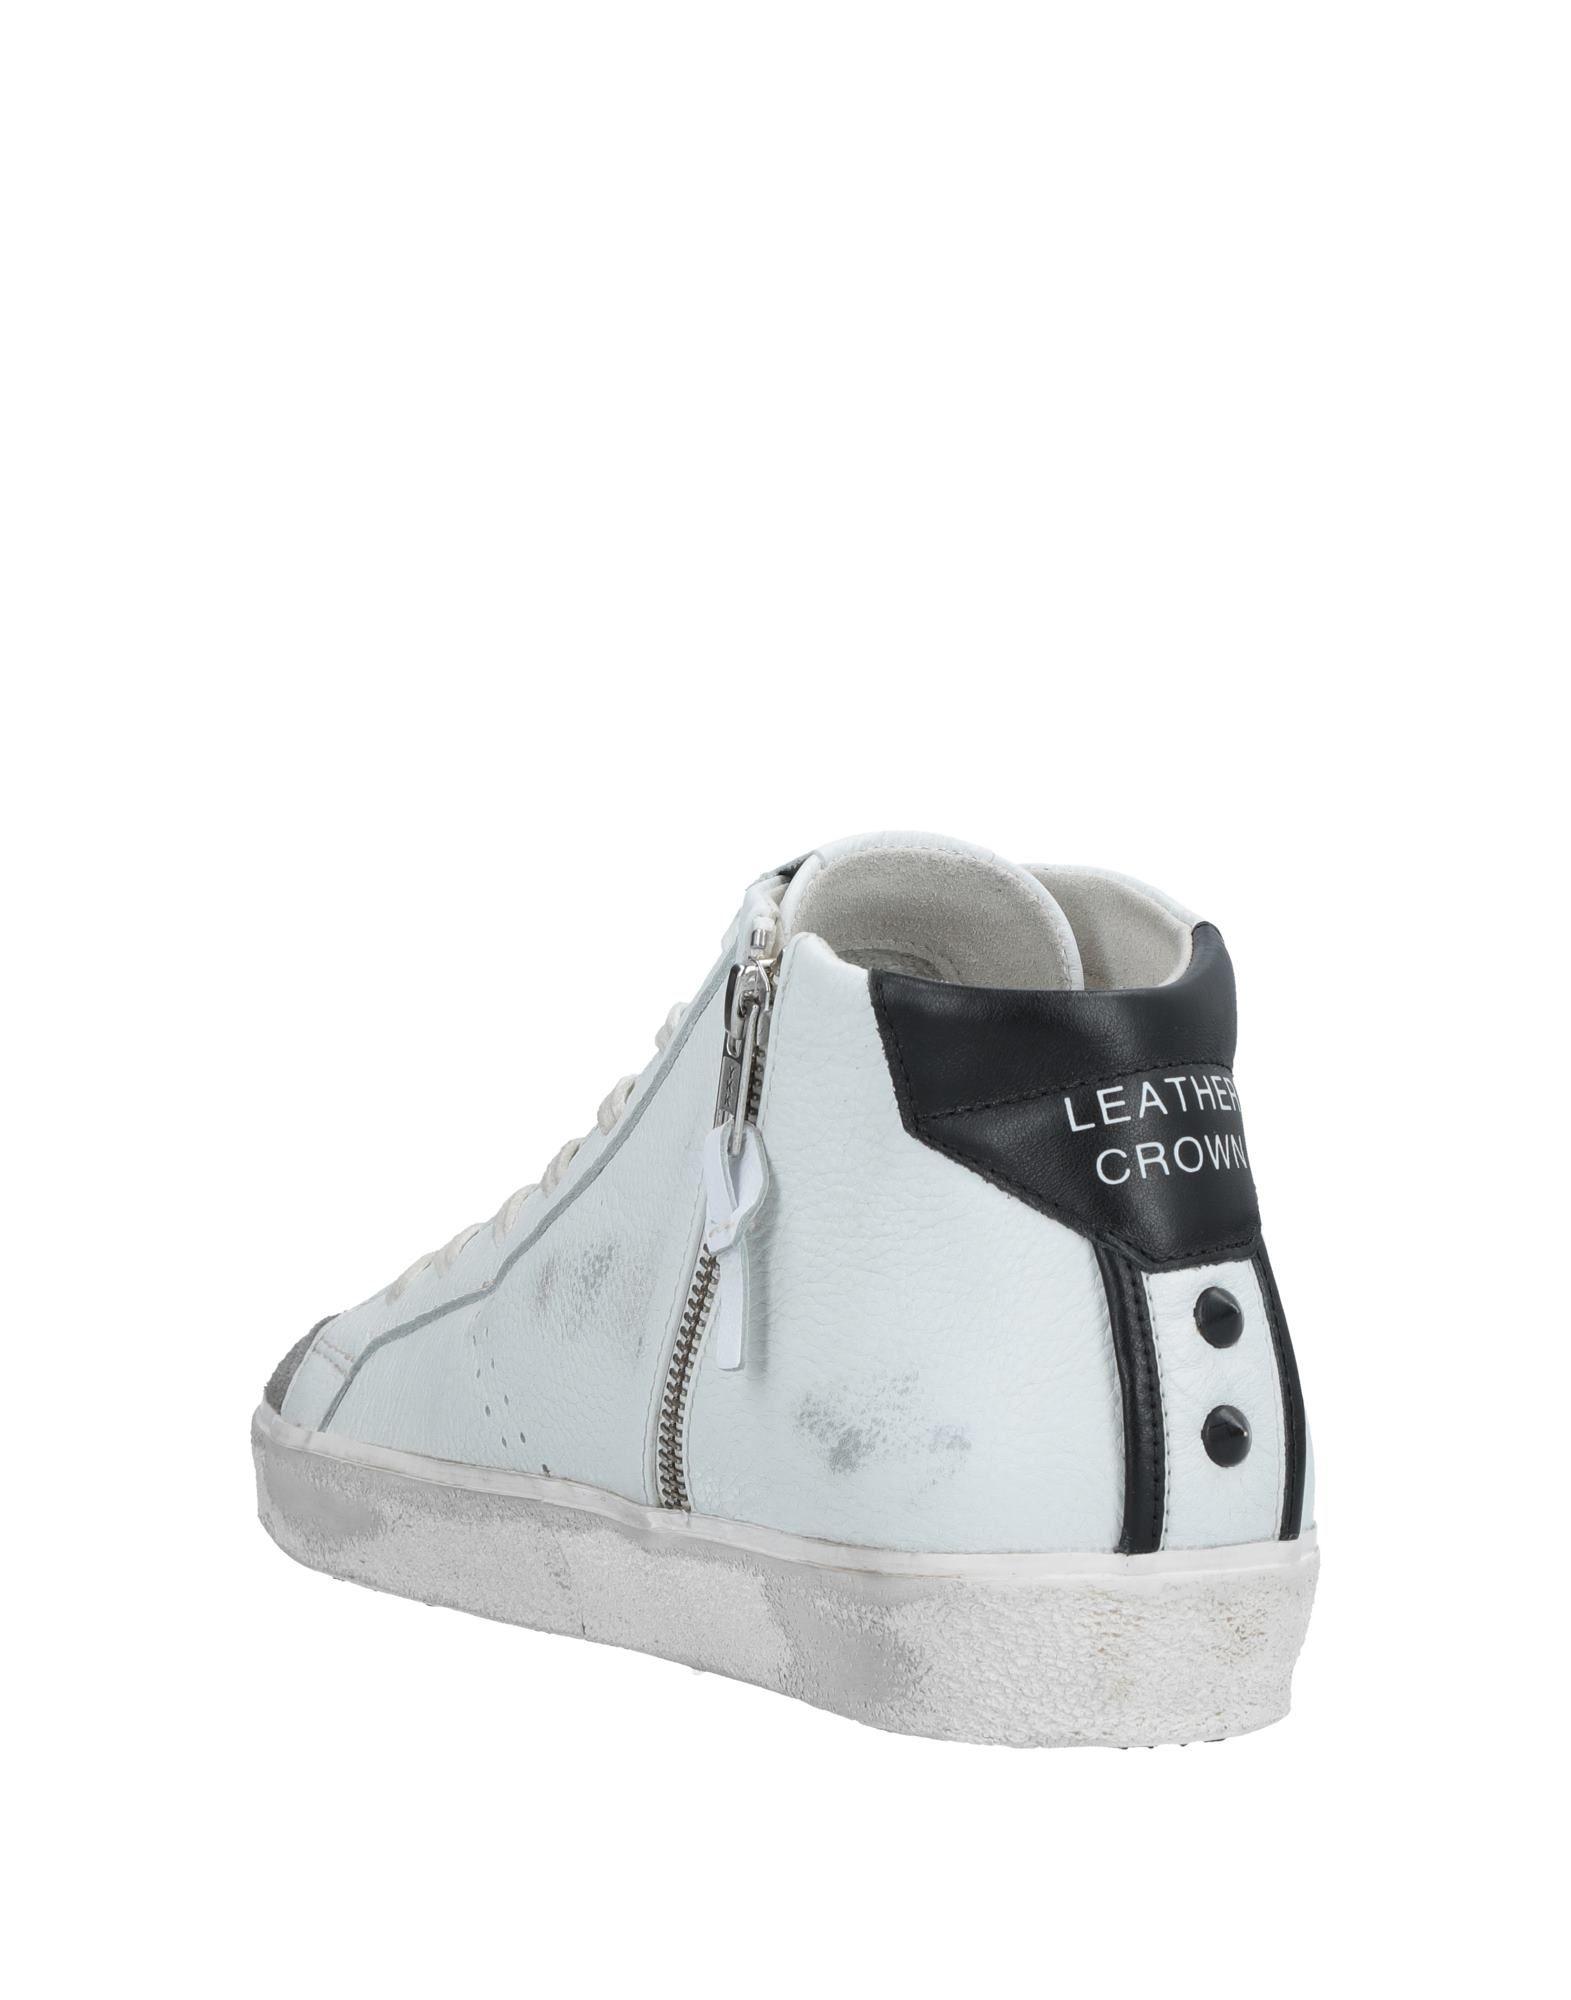 Leather Crown Sneakers Herren  11536653UR Neue Neue Neue Schuhe 8e75f2